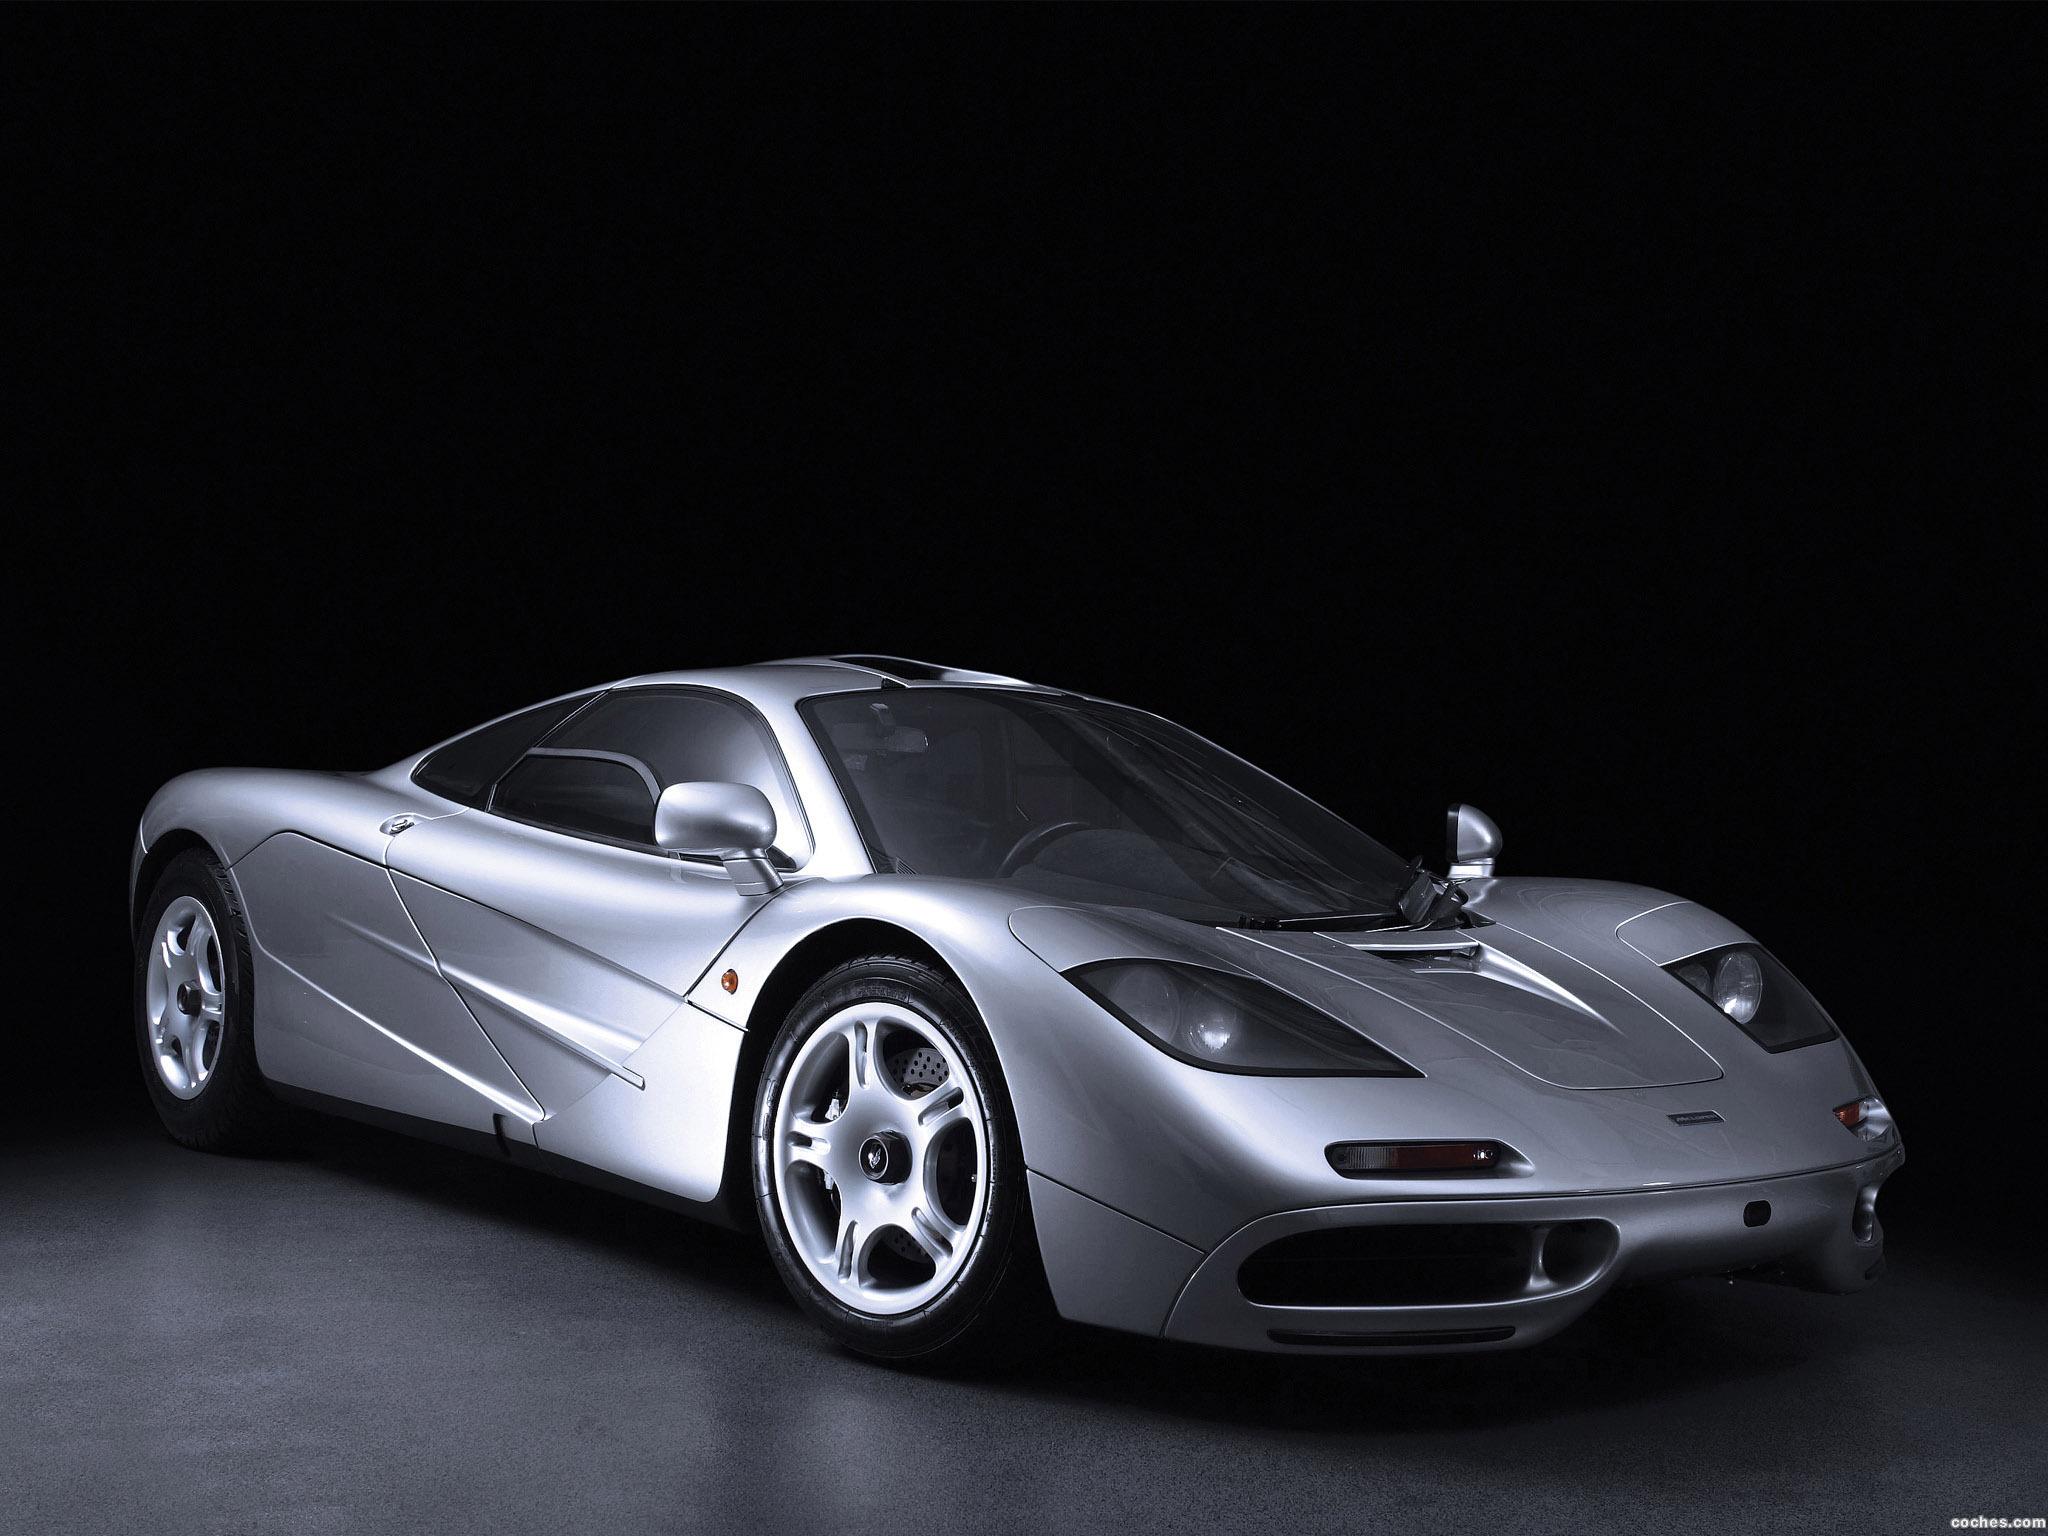 fotos coches f1: